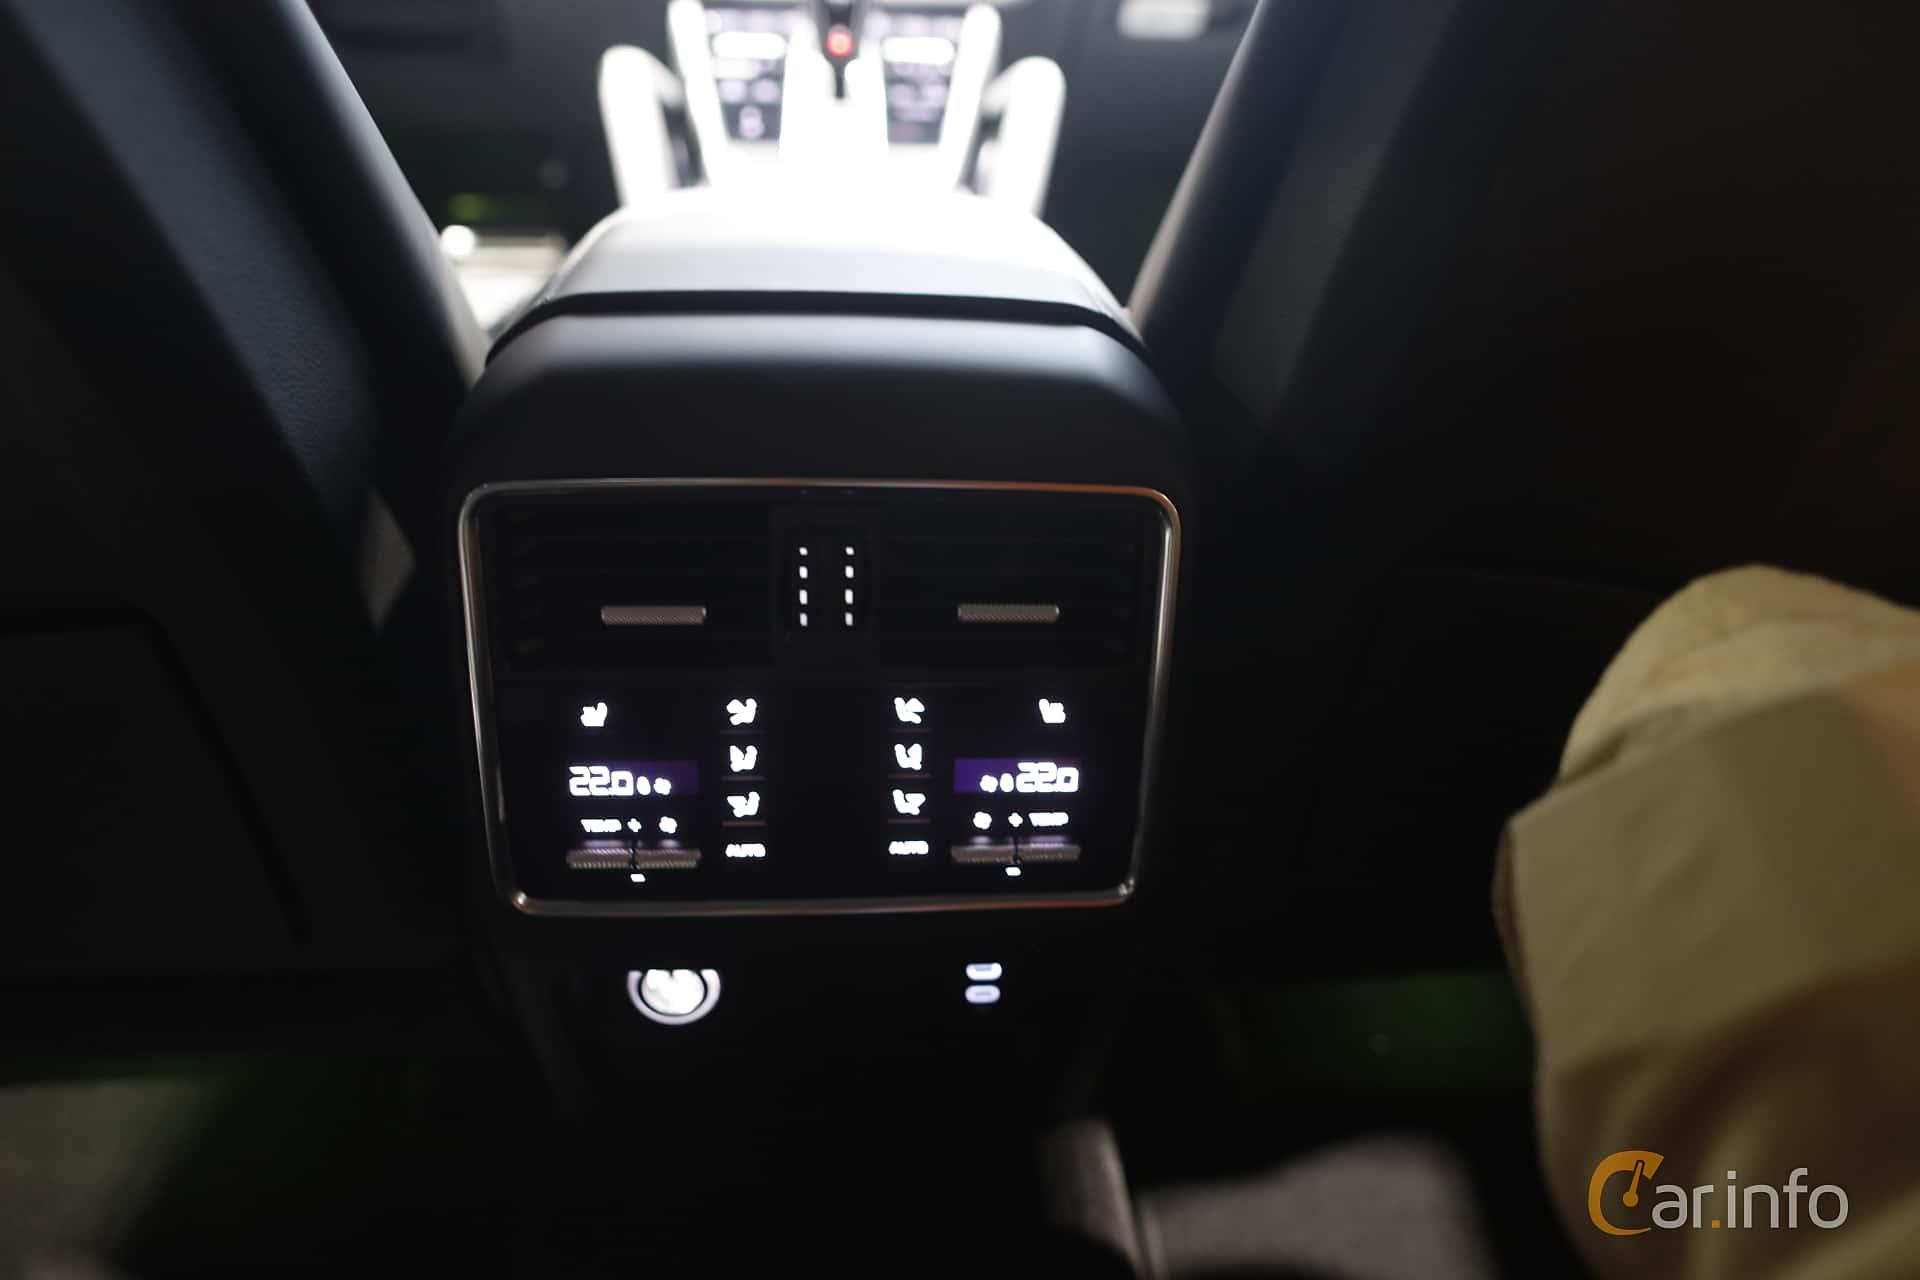 Porsche Cayenne Coupé Turbo S E-Hybrid 4.0 V8 TipTronic S, 680hp, 2020 at IAA 2019